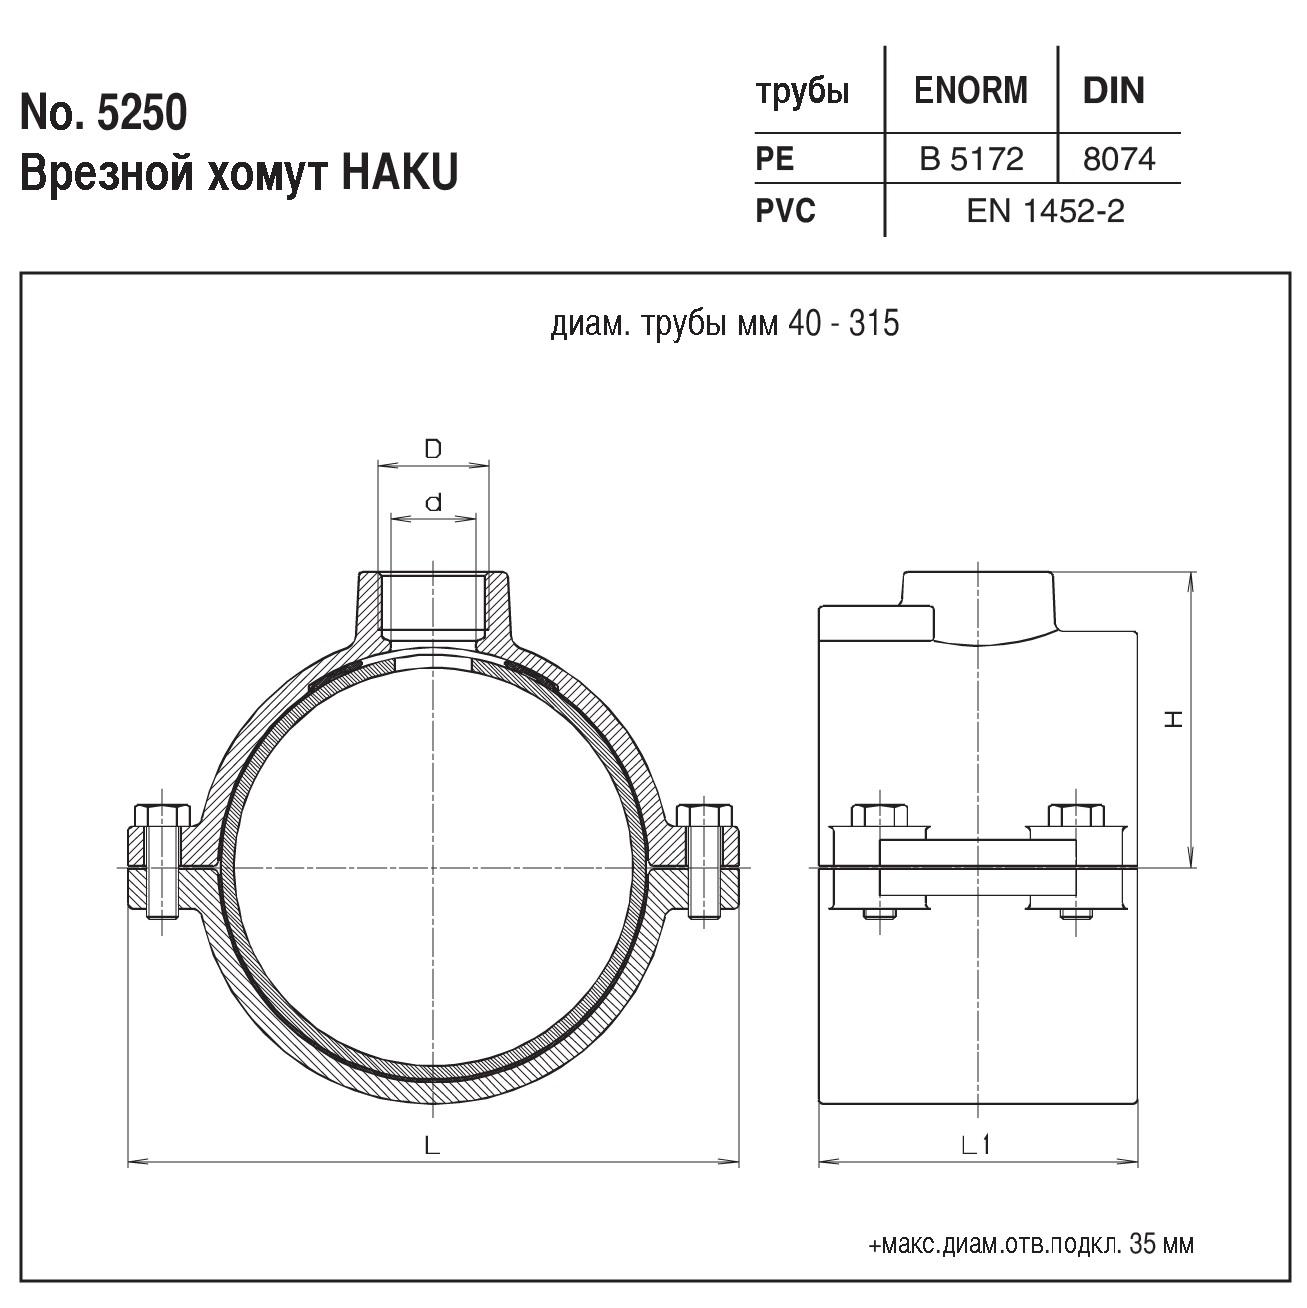 Чертеж для Врезной хомут Hawle HAKU 5250 резьбовой для ПЭ и ПВХ труб DN110